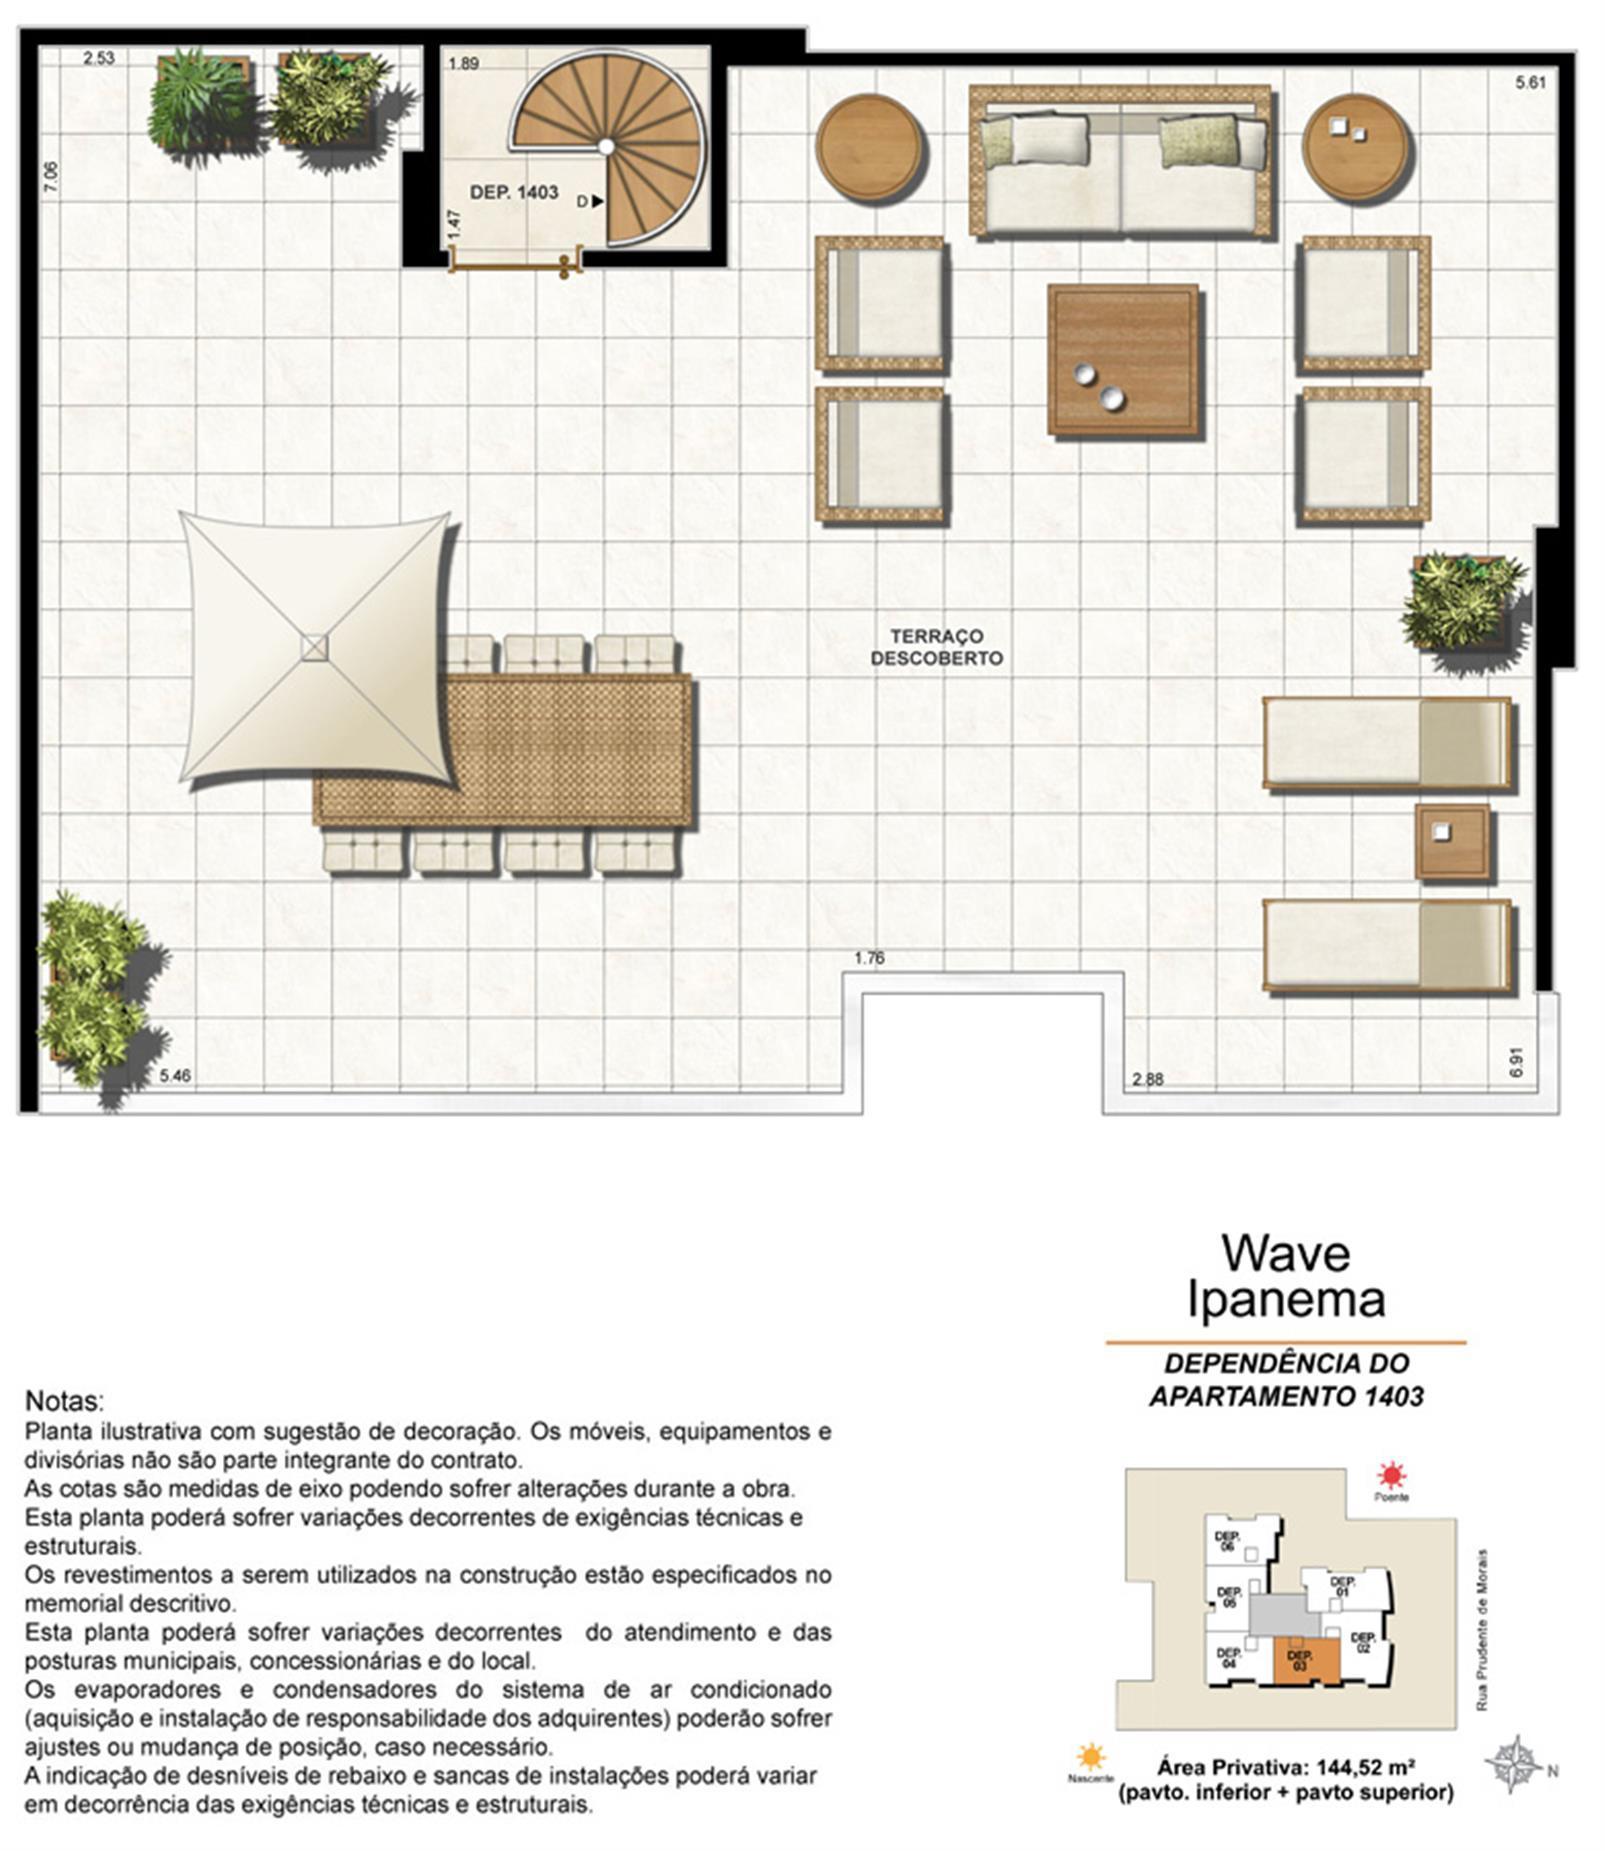 Dependência Cobertura 1403 | Wave Ipanema – Apartamentoem  Ipanema - Rio de Janeiro - Rio de Janeiro